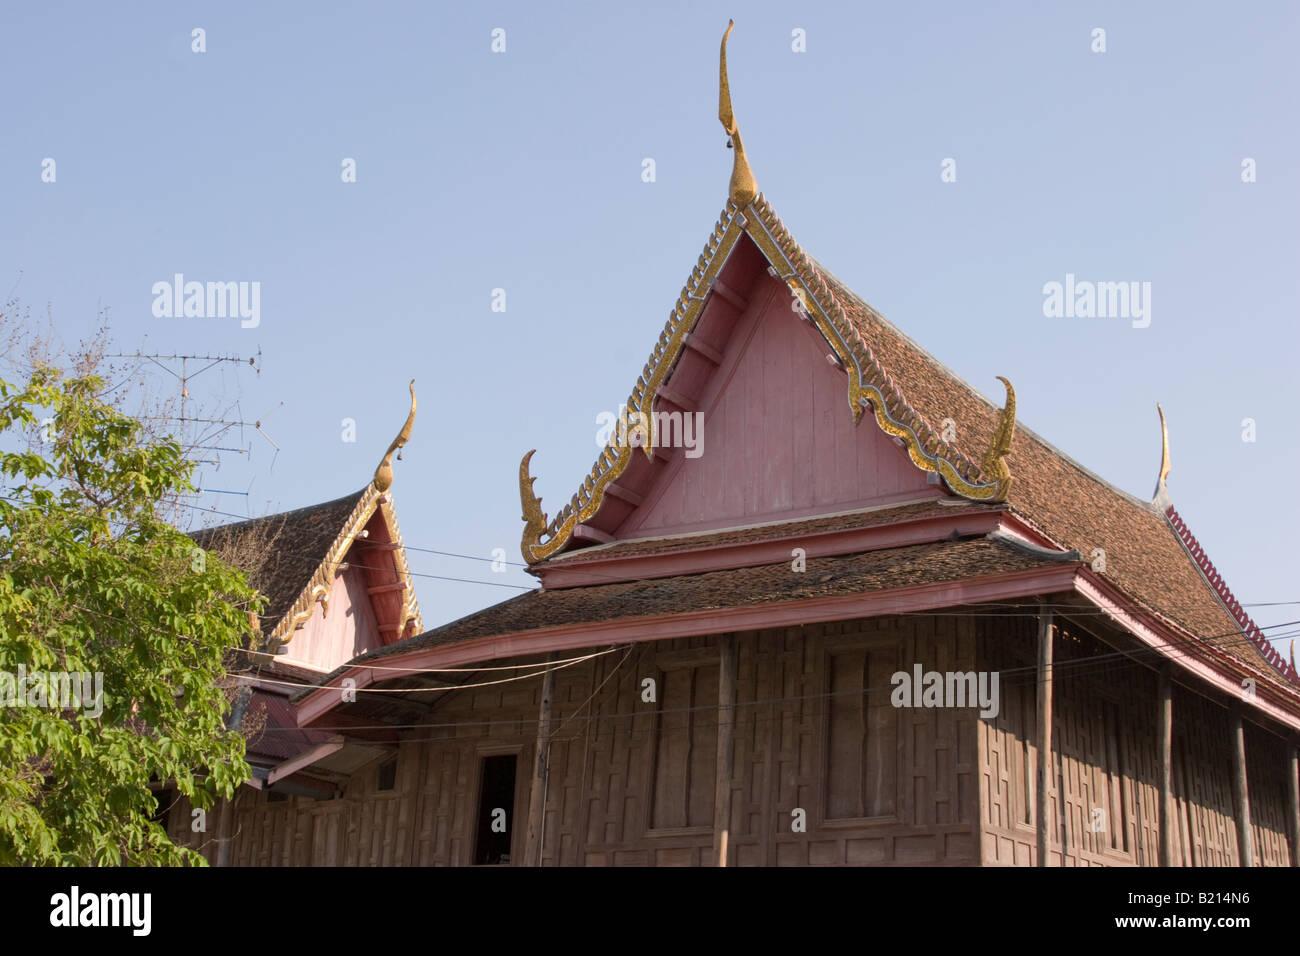 Traditional wooden Thai Buddhist temple Wat Yai Suwannaram, Phetchaburi, Thailand Stock Photo